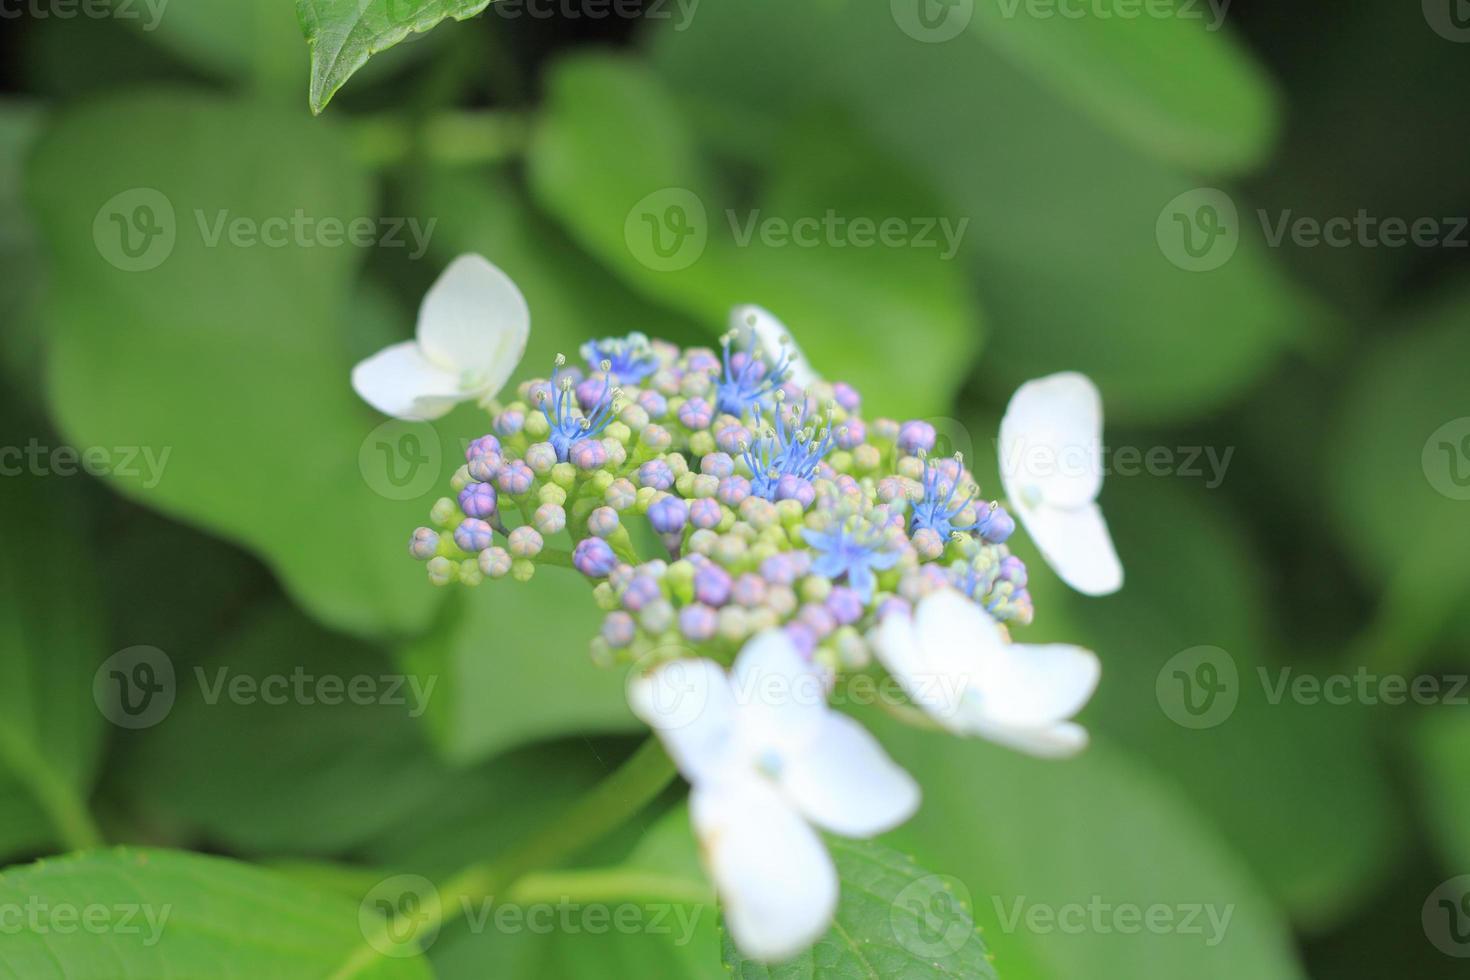 Hydrangea Flower close up photo